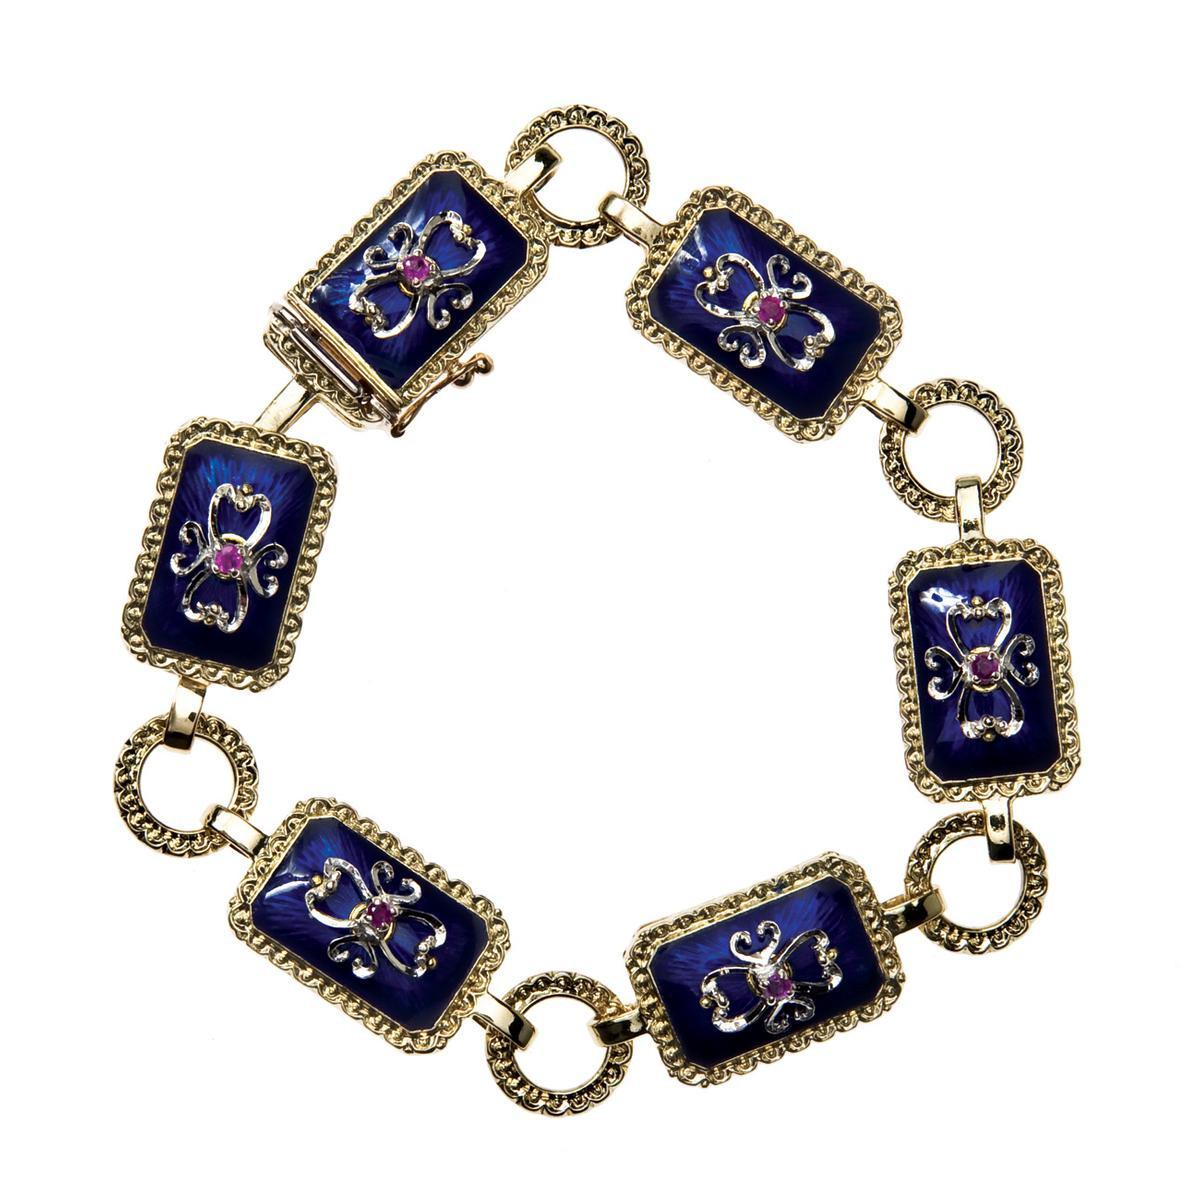 Vintage Ruby & Blue Enamel Bracelet